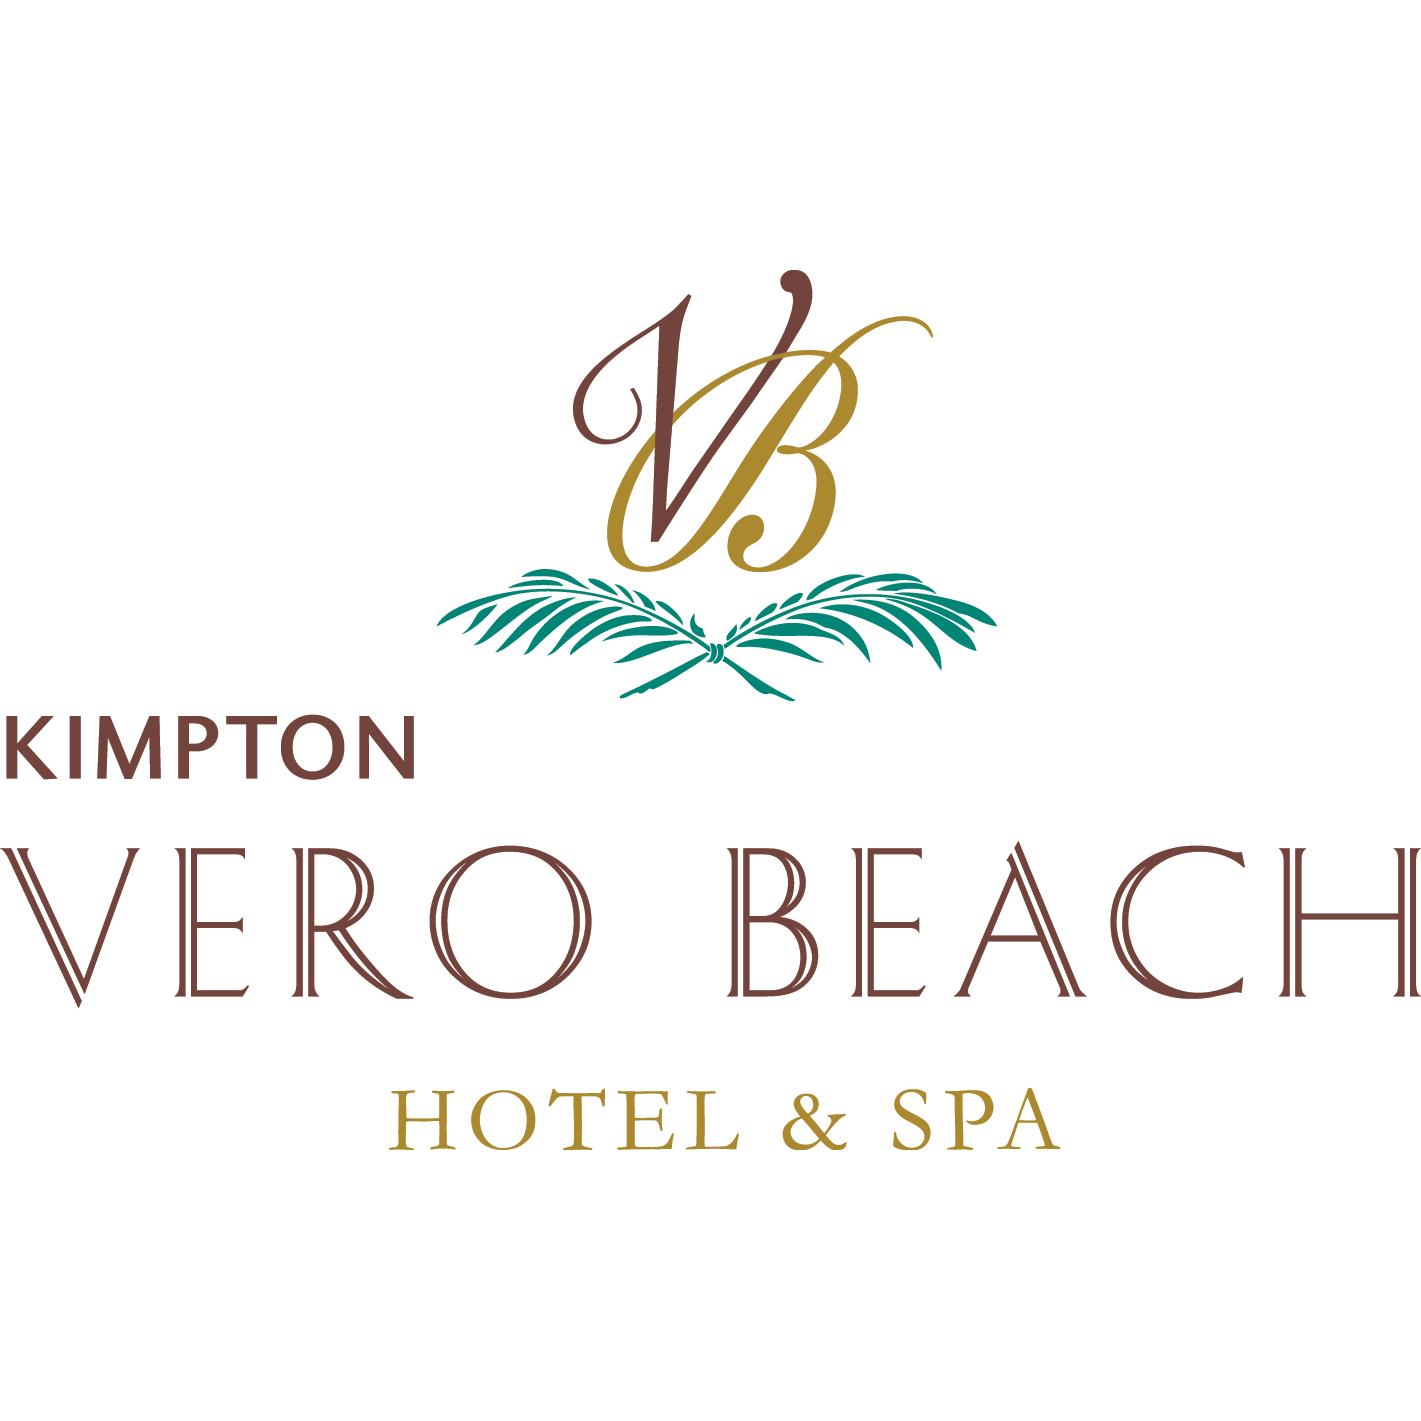 Kimpton Vero Beach Hotel & Spa - Vero Beach, FL - Hotels & Motels